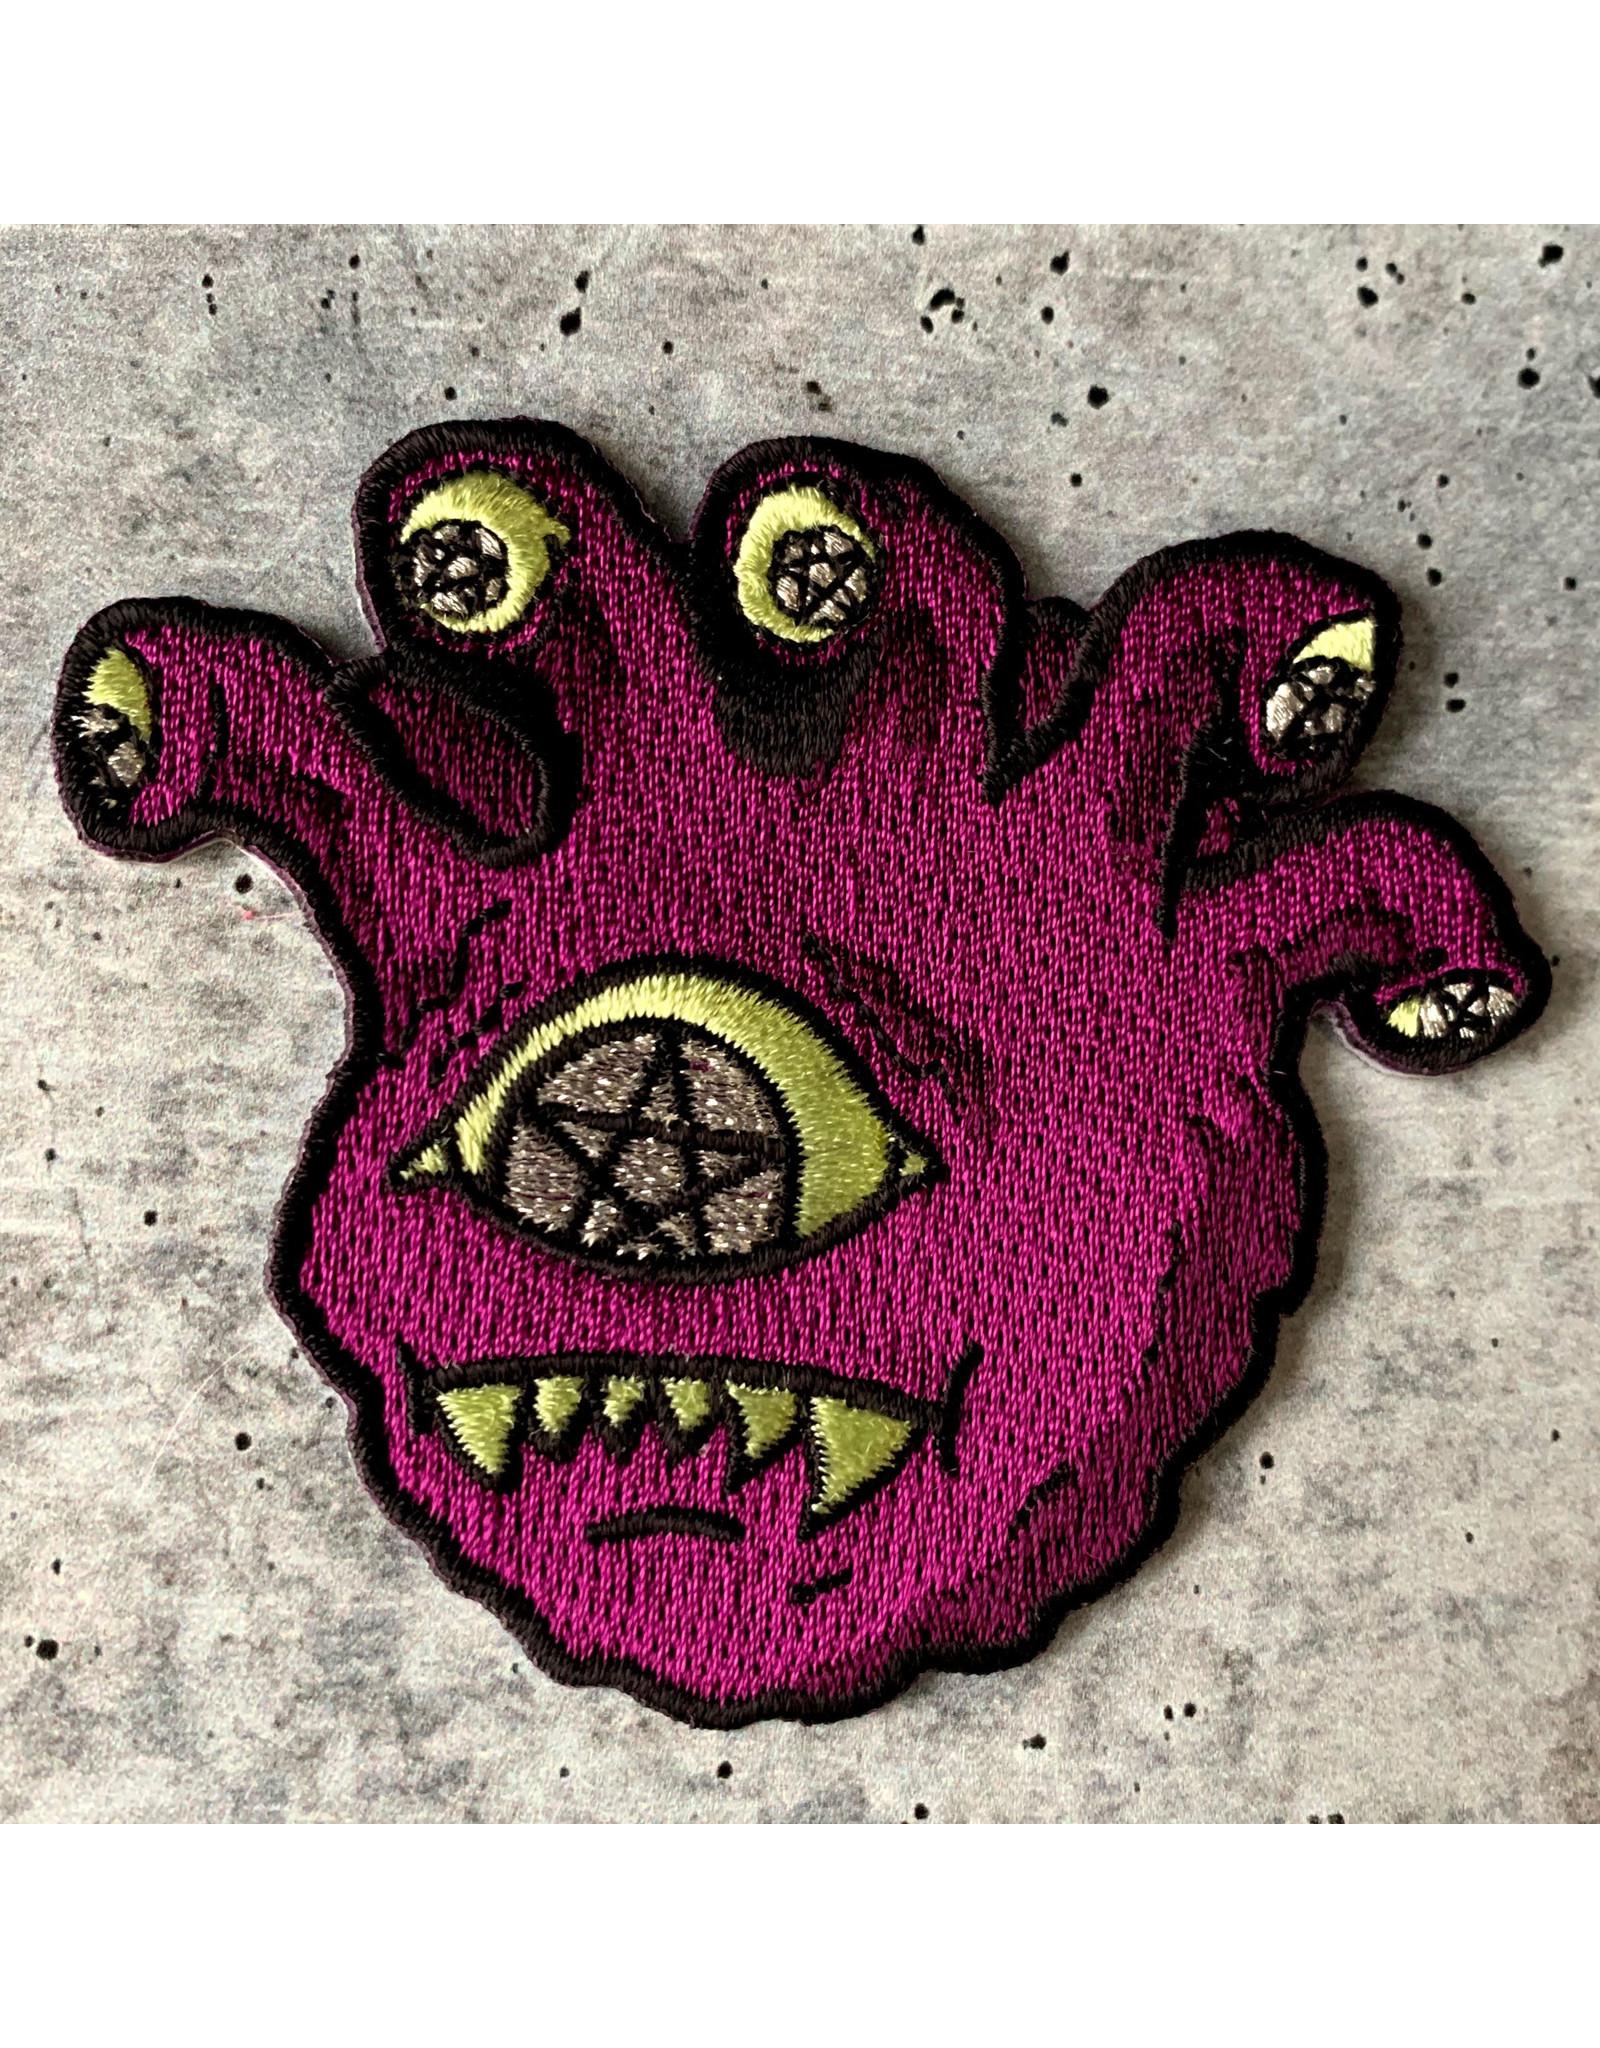 Creature Curation Eyevil Eyegor – Patch